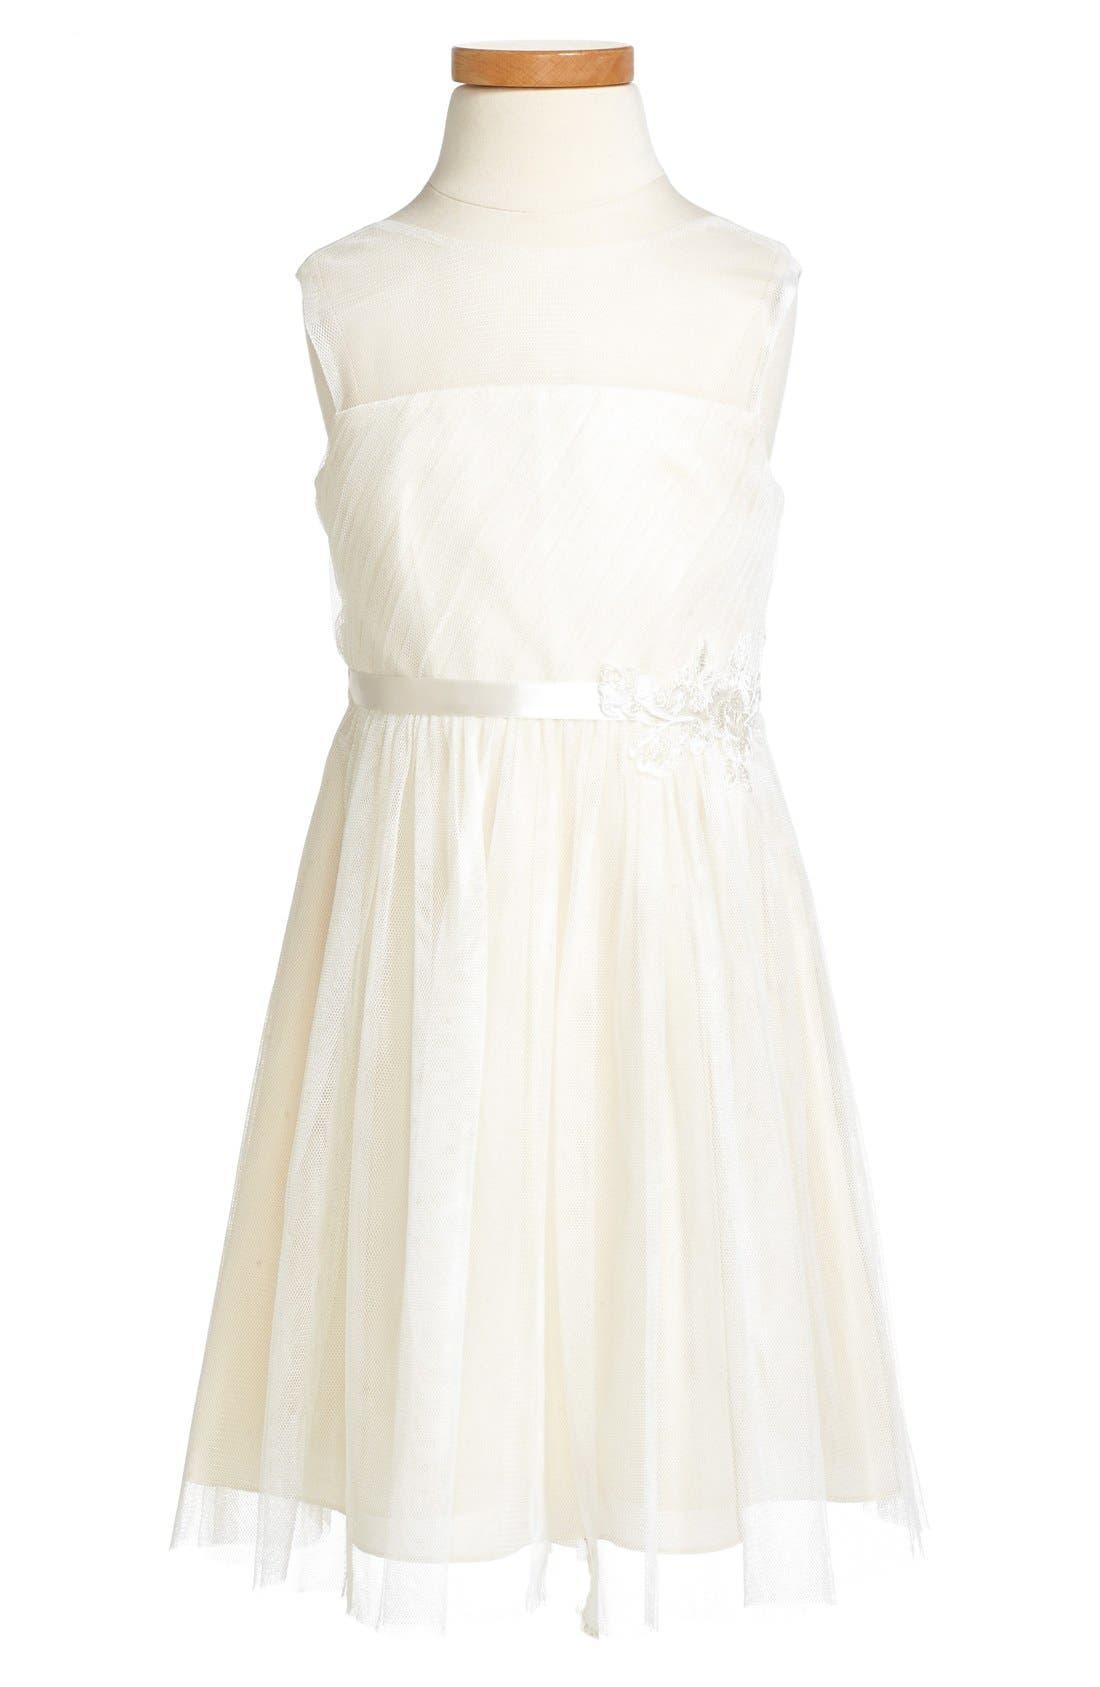 Alternate Image 3  - Jenny Yoo 'Zoe' Floral Appliqué Tulle Dress (Toddler, Little Girls & Big Girls)